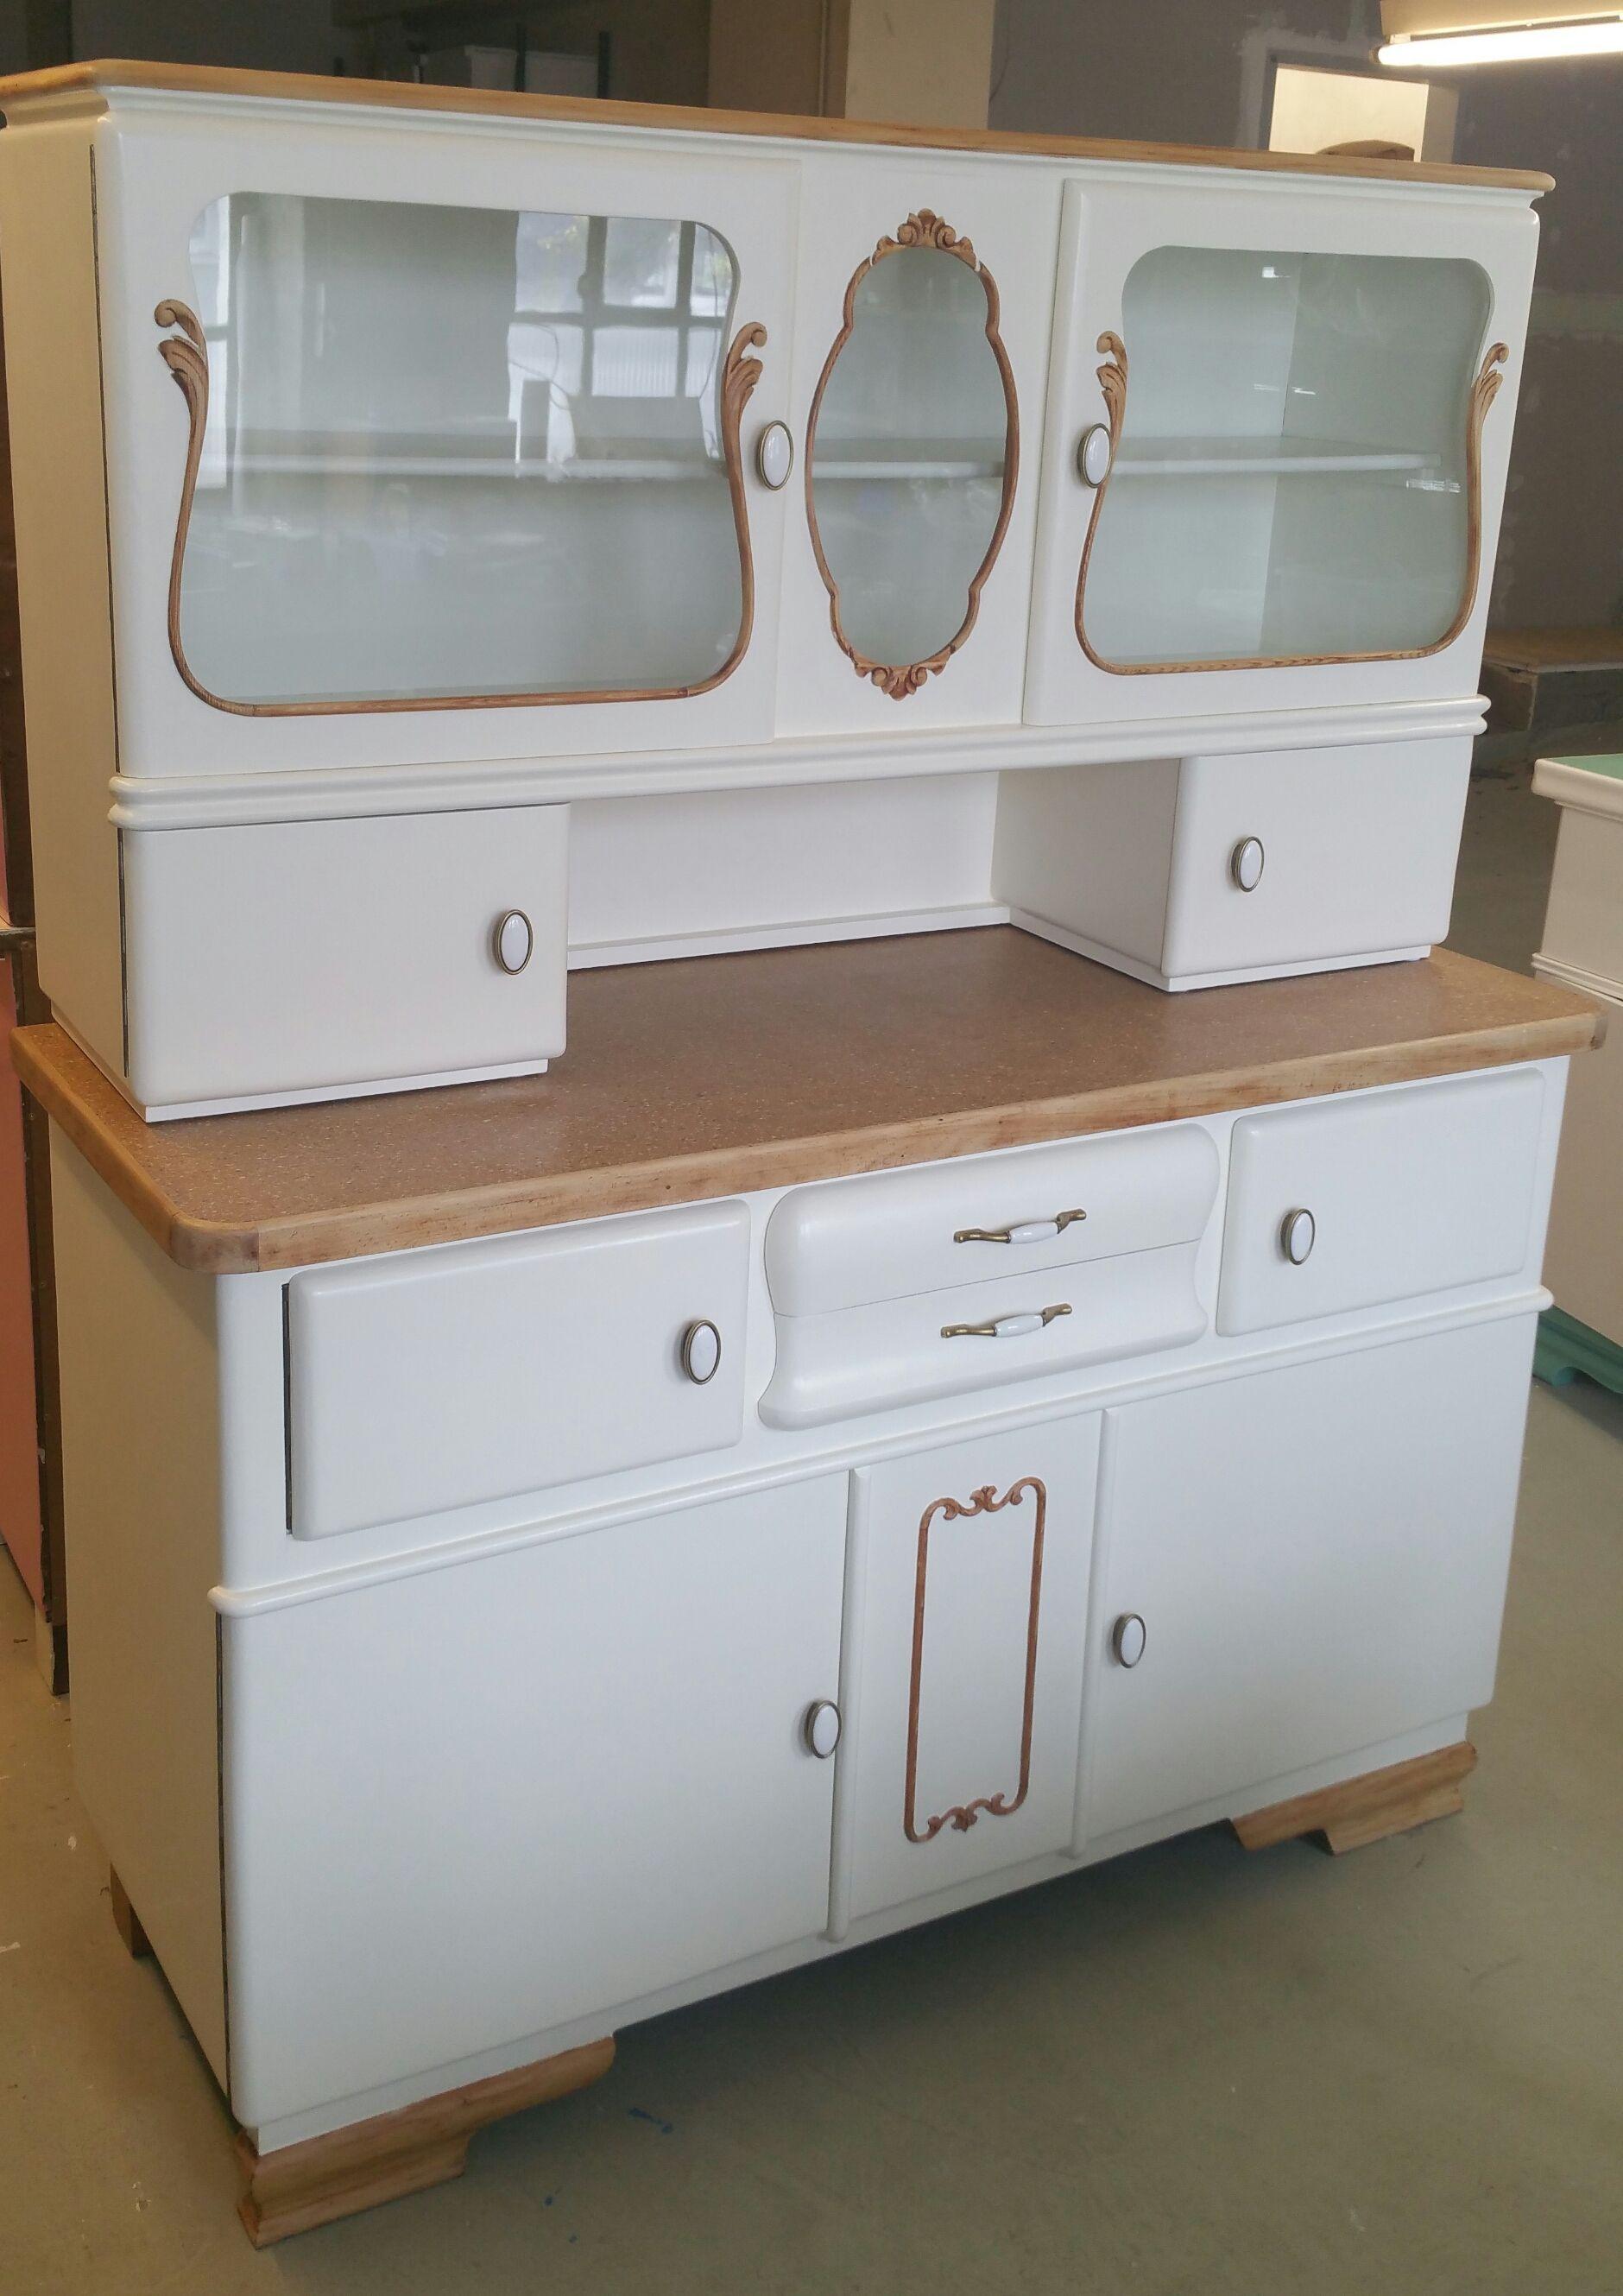 k chenbuffet 50er jahre m bel redesign individuell nach. Black Bedroom Furniture Sets. Home Design Ideas